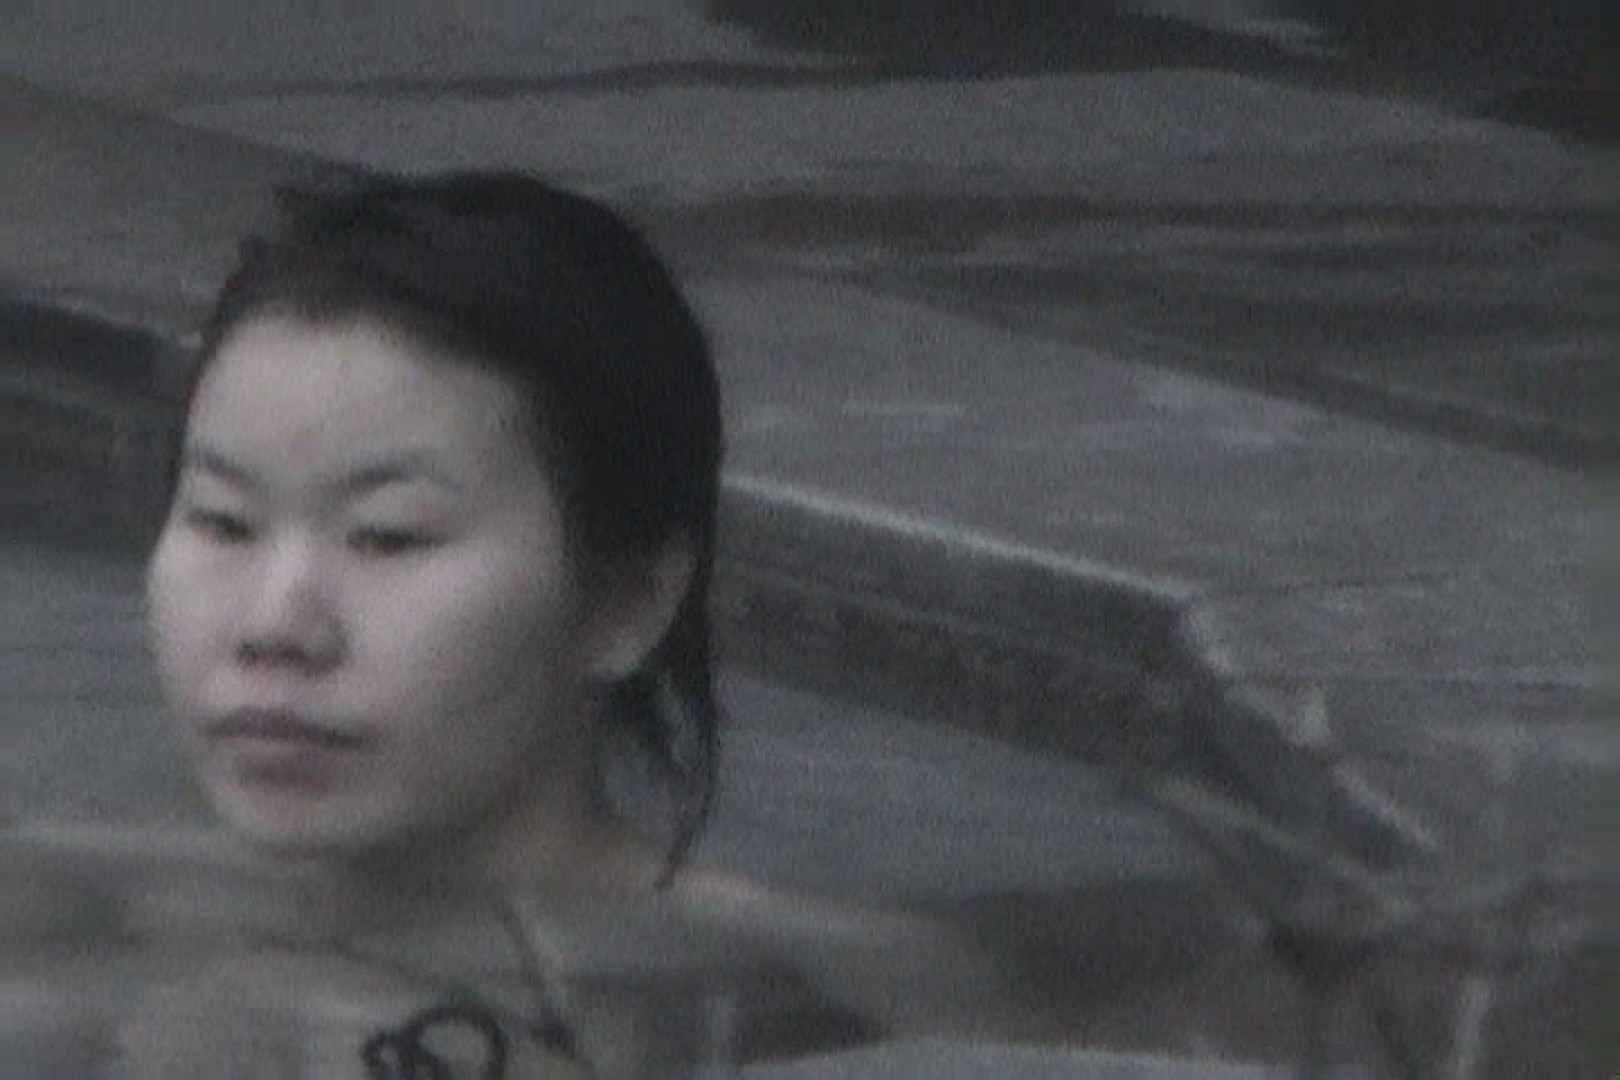 Aquaな露天風呂Vol.556 露天風呂編  99PIX 20